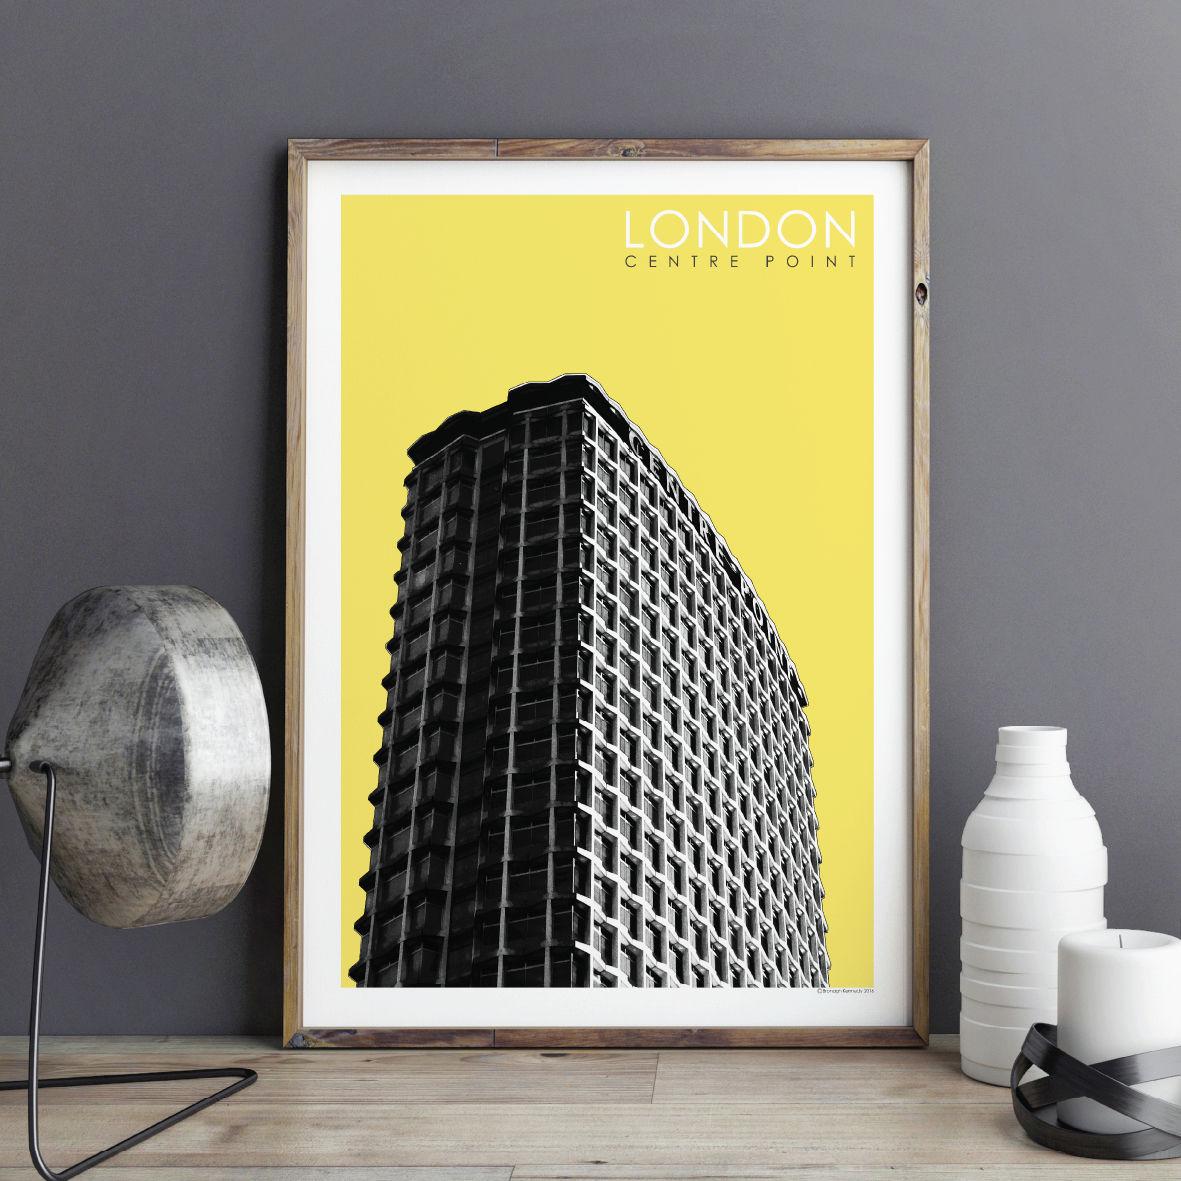 London Prints - Centre Point - BRONAGH KENNEDY ART PRINTS